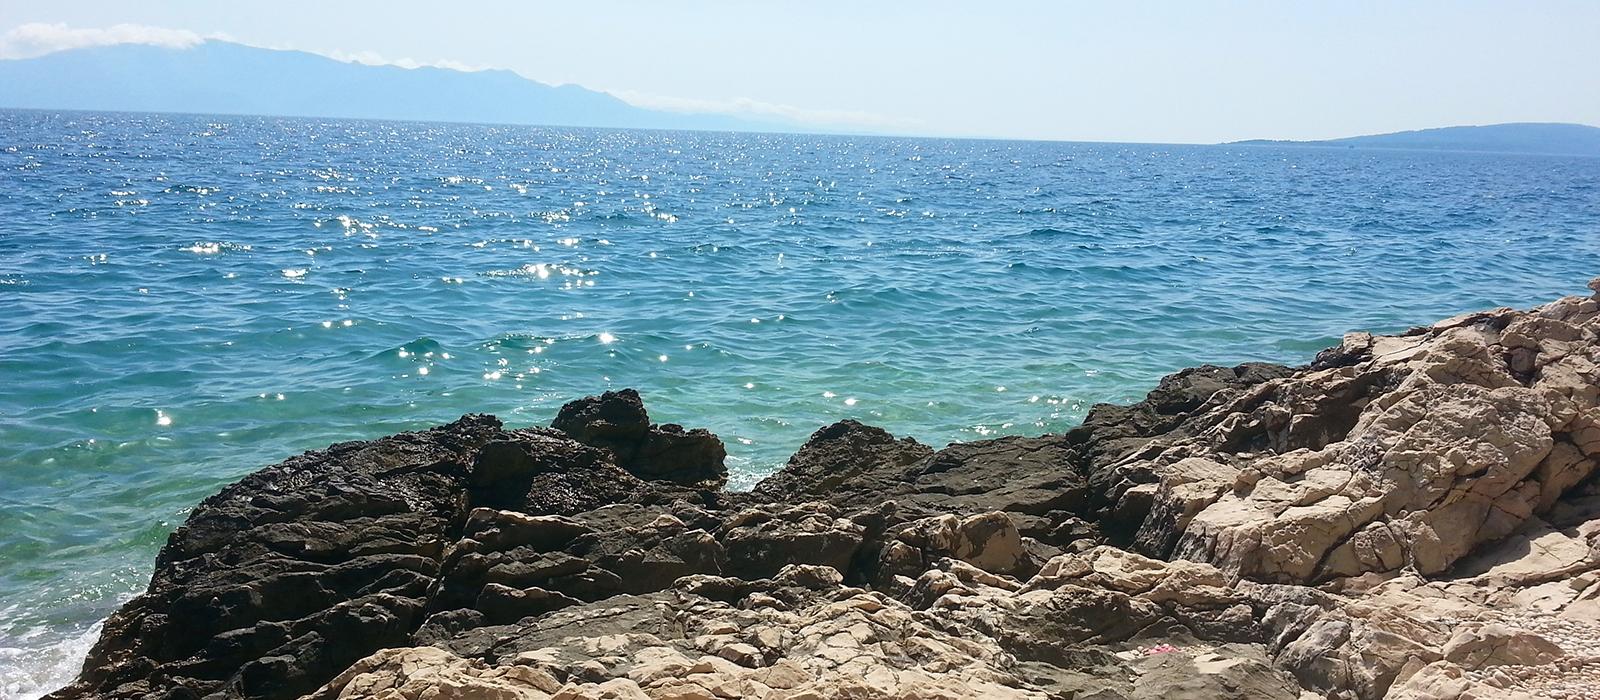 Croazia_20140812_144934